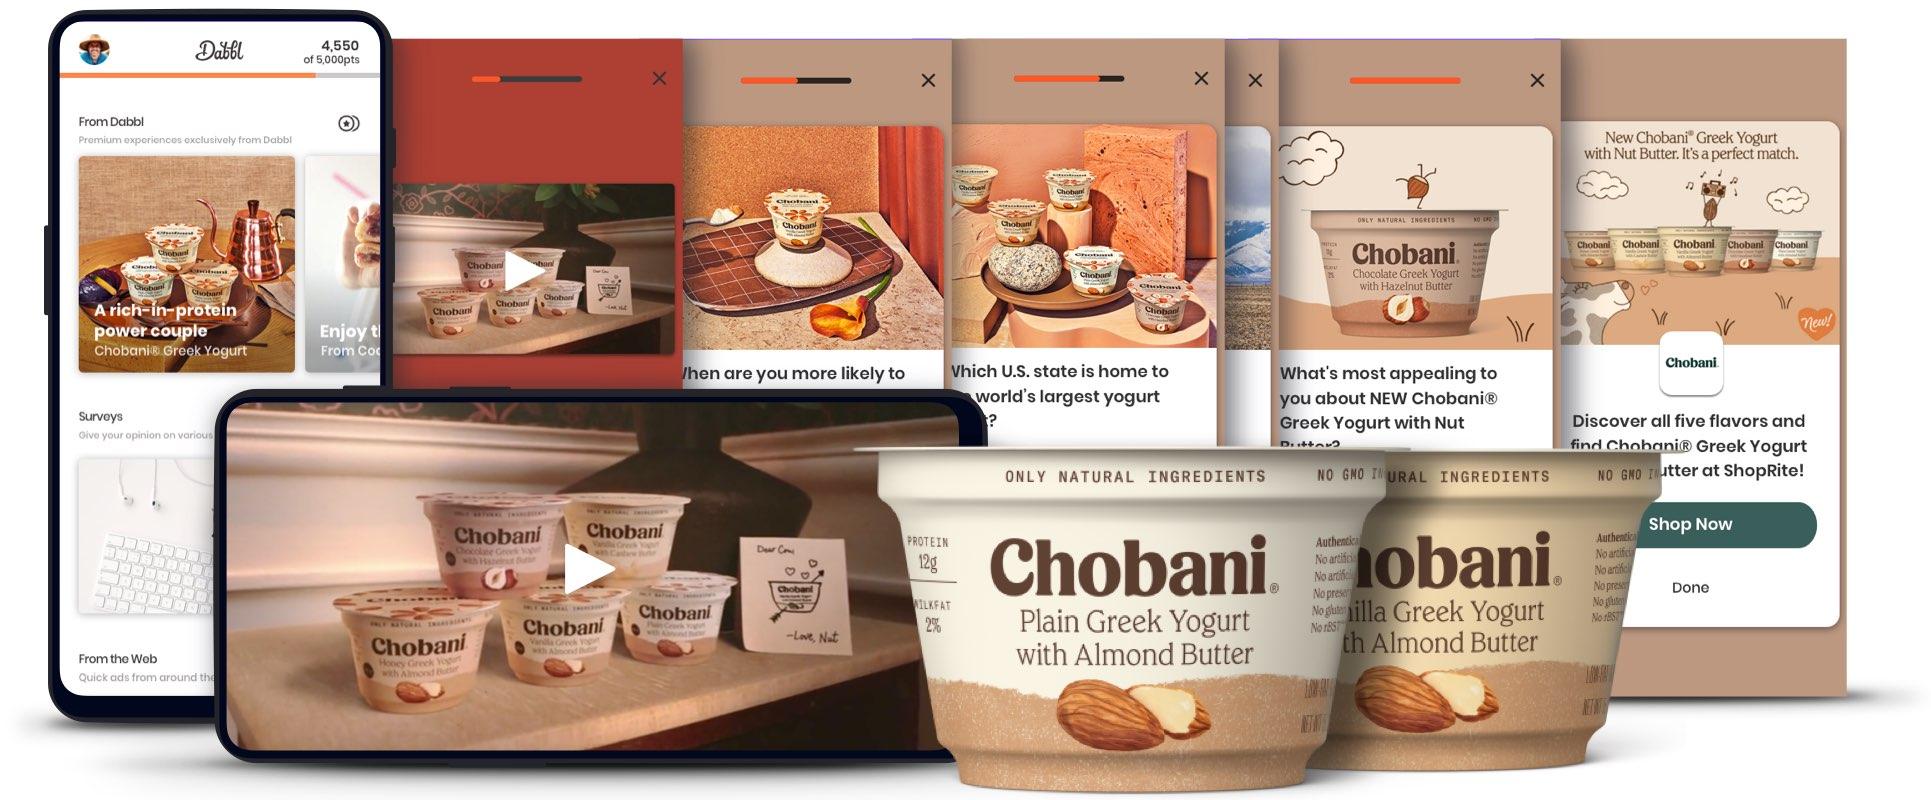 Chobani brand experience